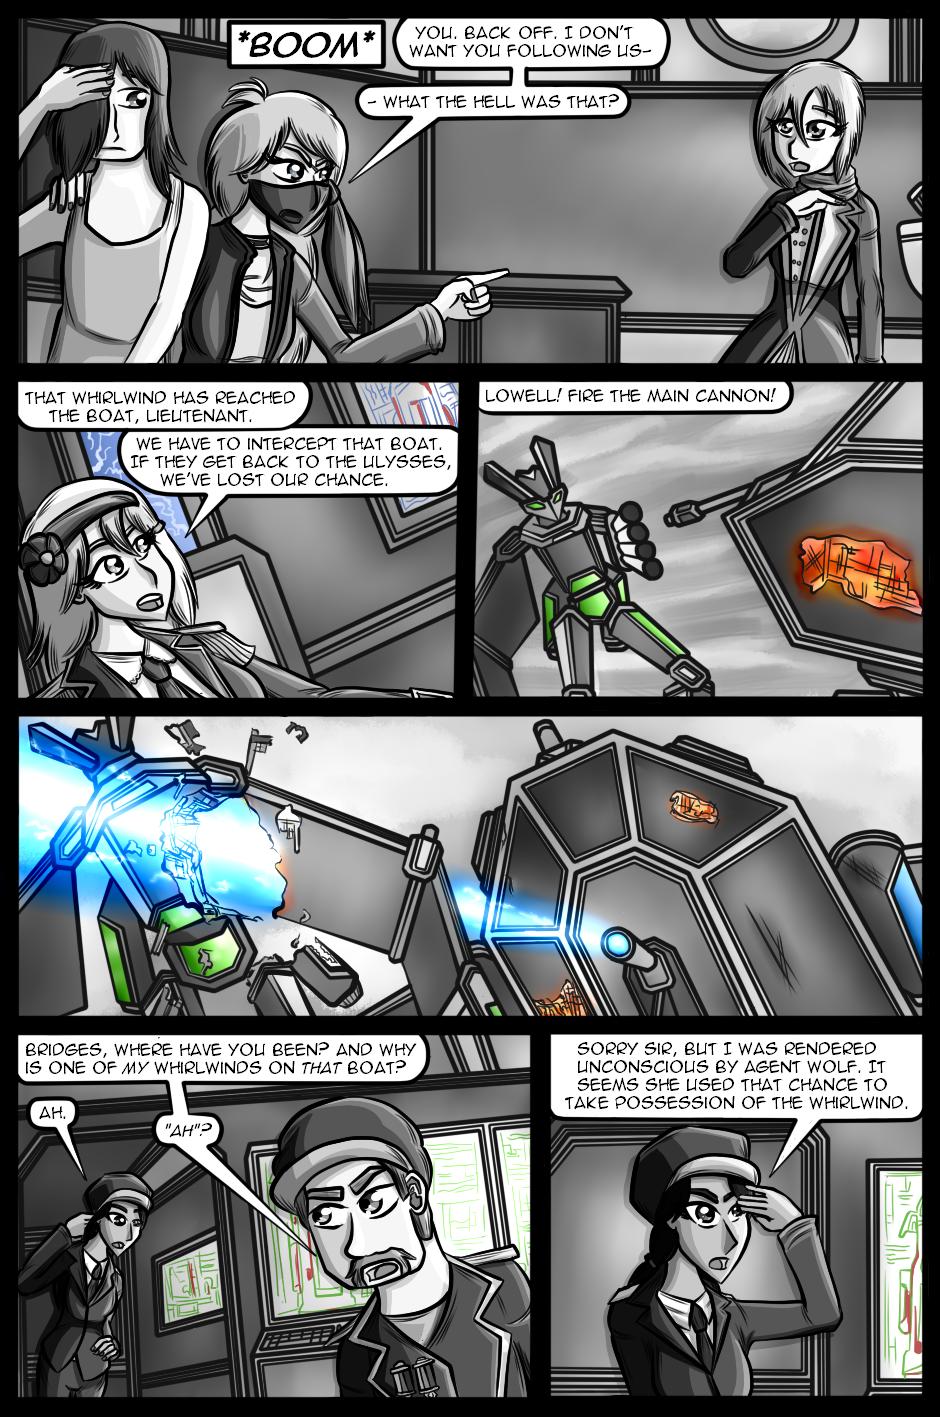 Fire Suppression, Part 35